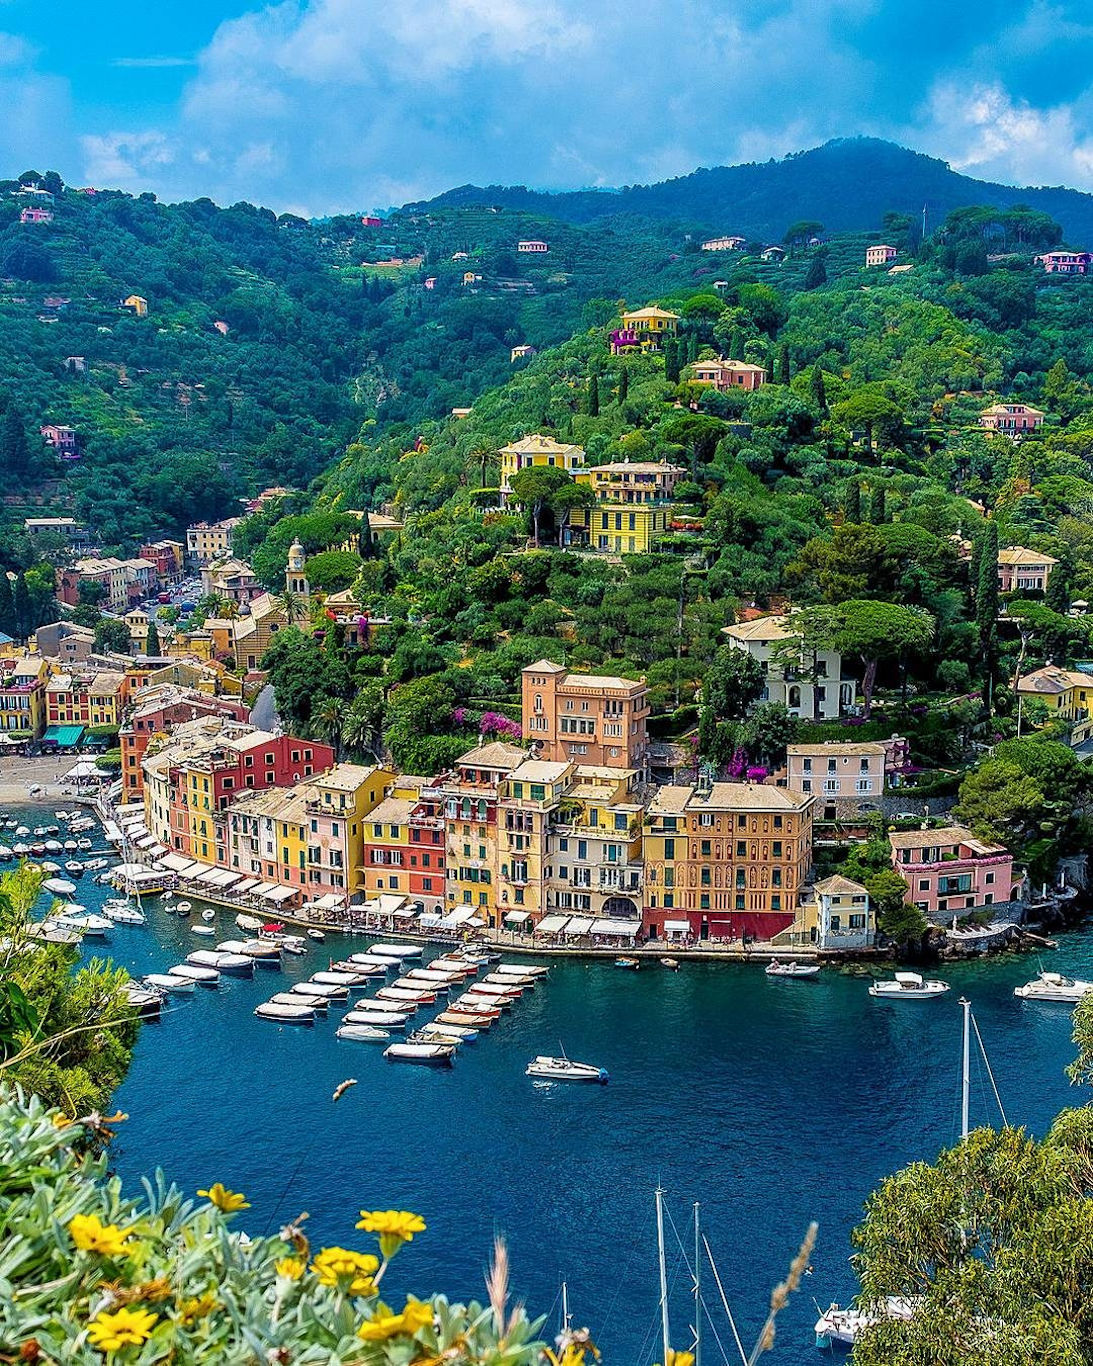 @blogsognoitaliano - Portofino Ligurië (2)